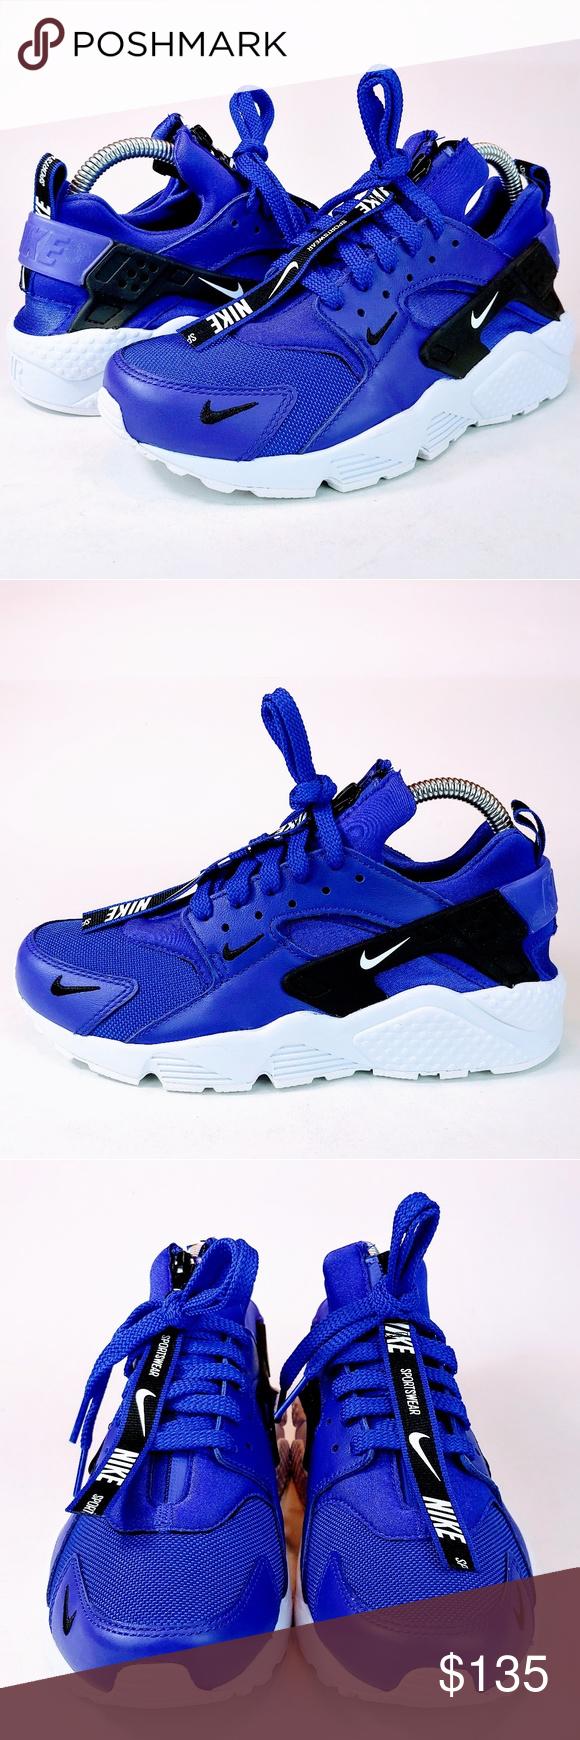 SOLD💥 Nike Air Huarache Run Premium Indigo (With images